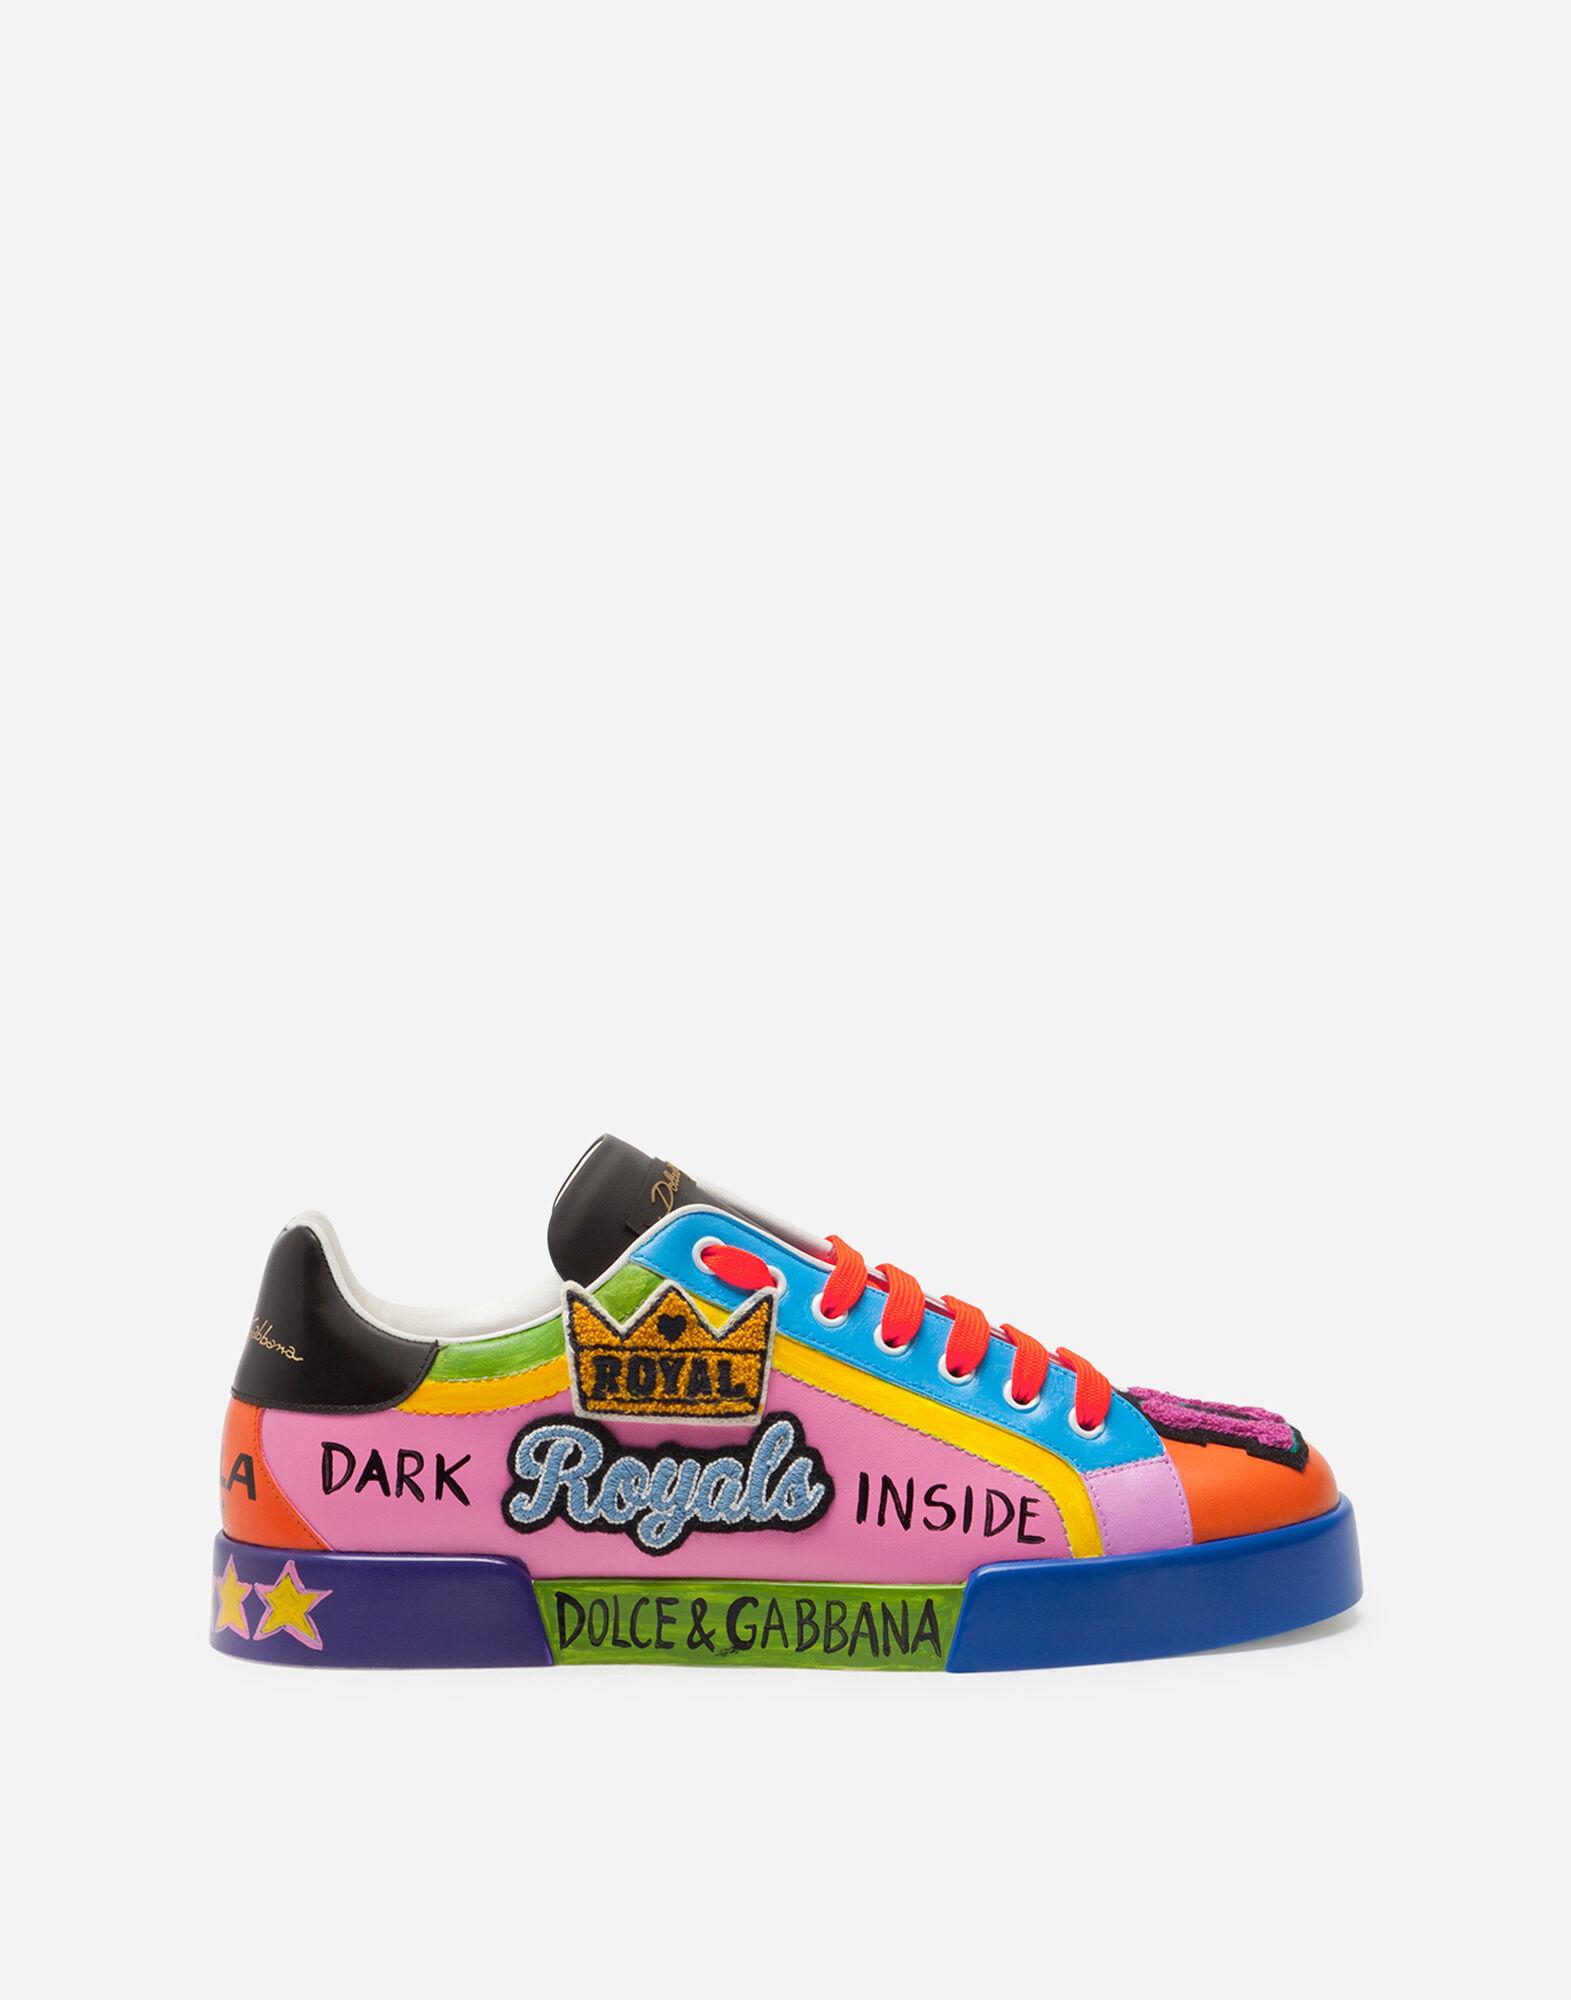 Sneakers et Slip on pour Homme   Dolce&Gabbana SNEAKERS PORTOFINO BY EMIS KILLA